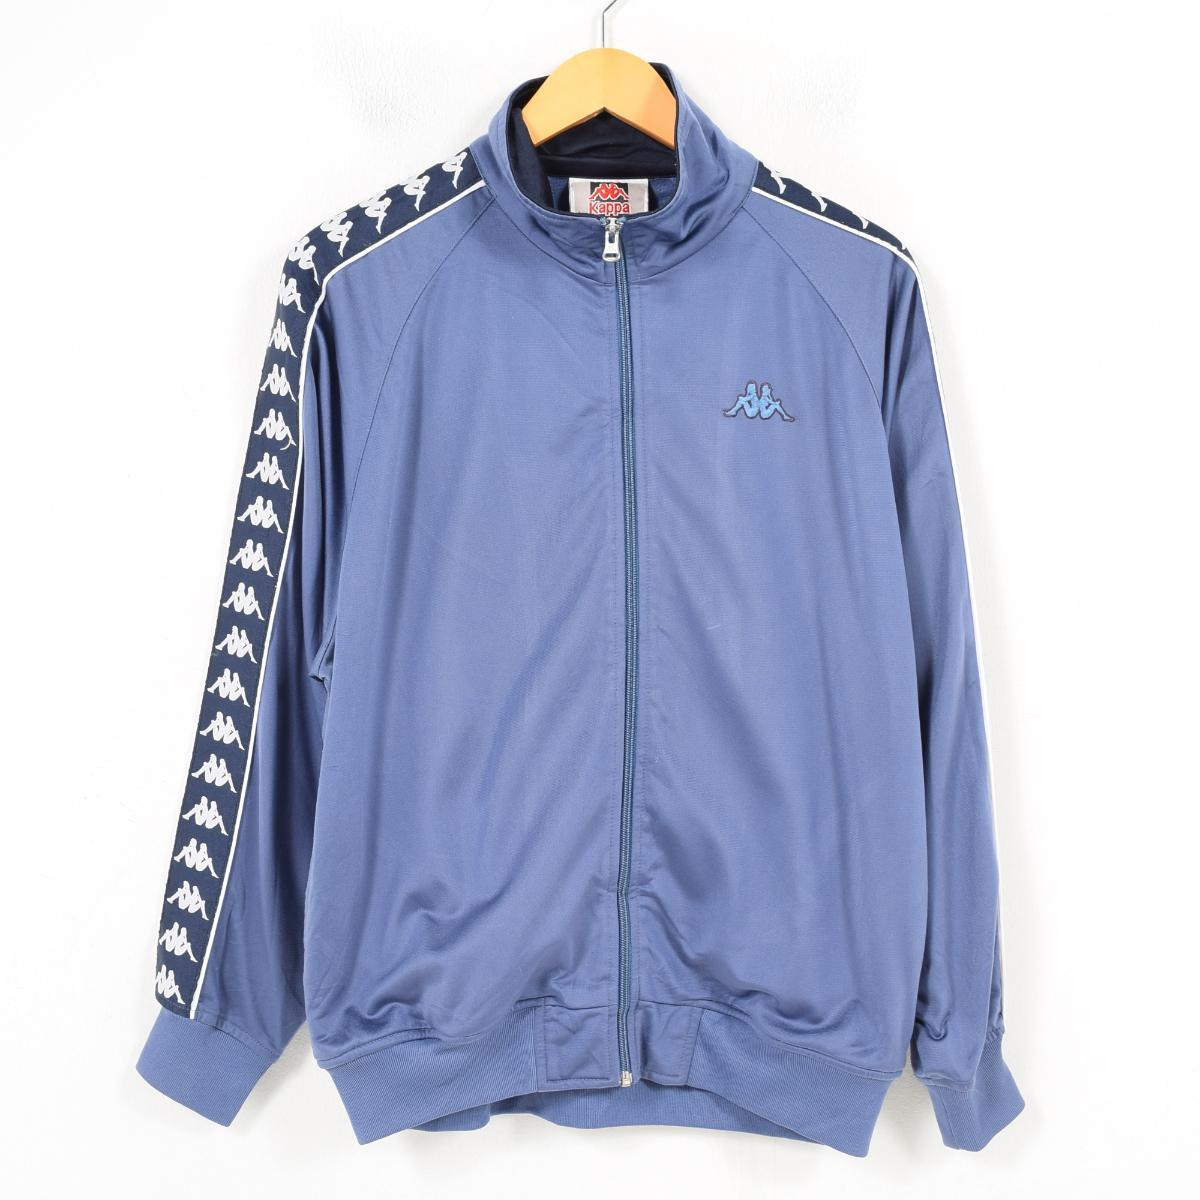 Vintage Clothing Jam 90s Rain Jacket Kappa Jersey Truck Jacket Men